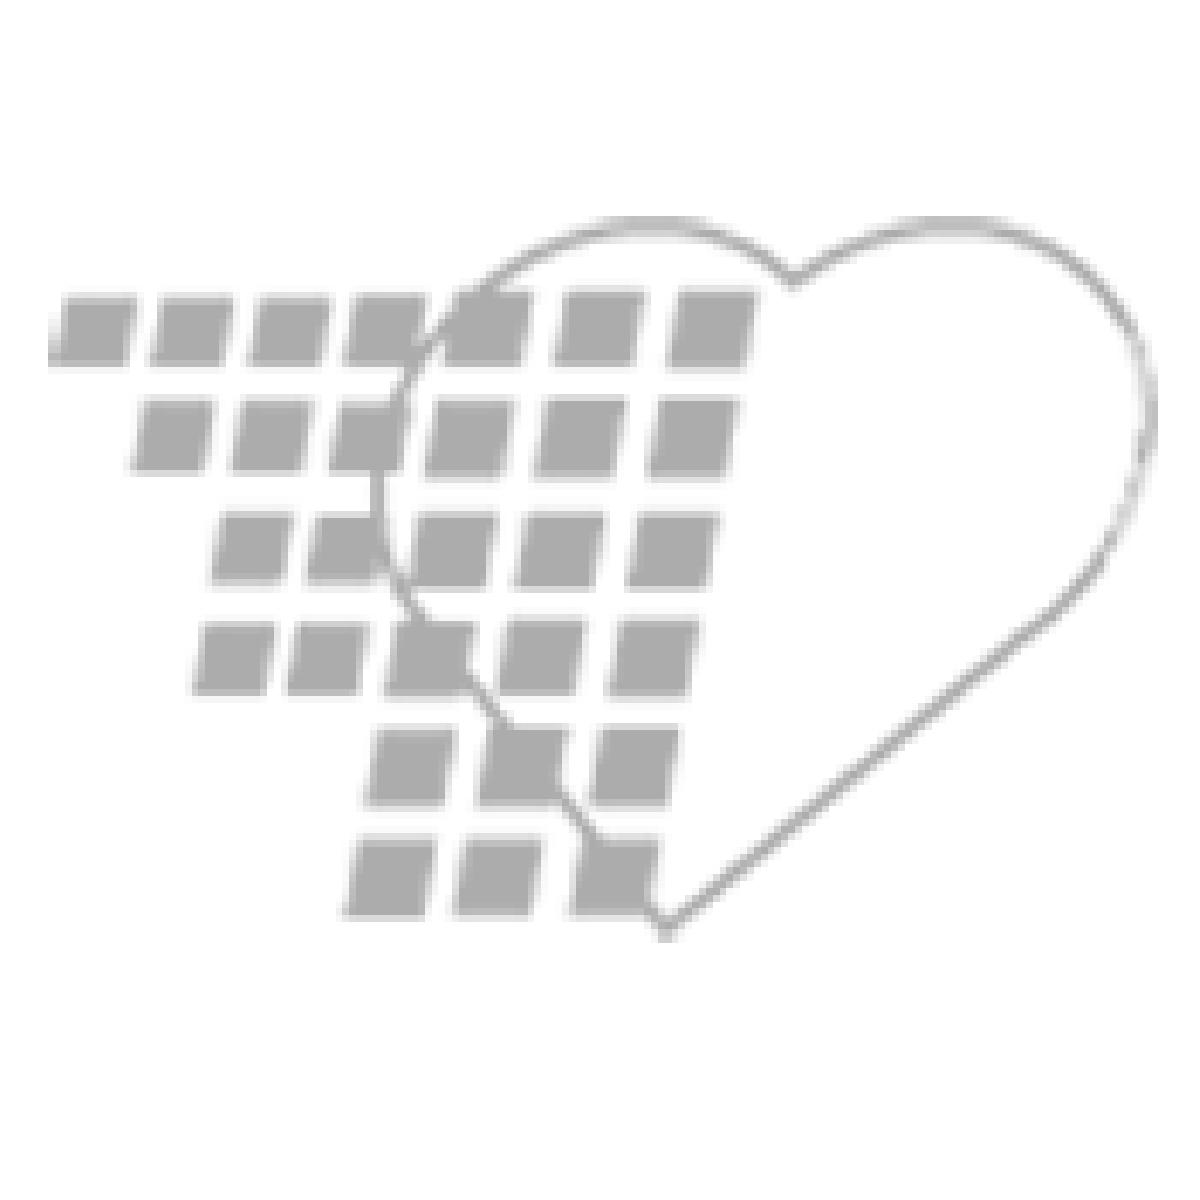 02-99-0048 - Bulb 2.5V Laryngoscope Replacement for WA 04800